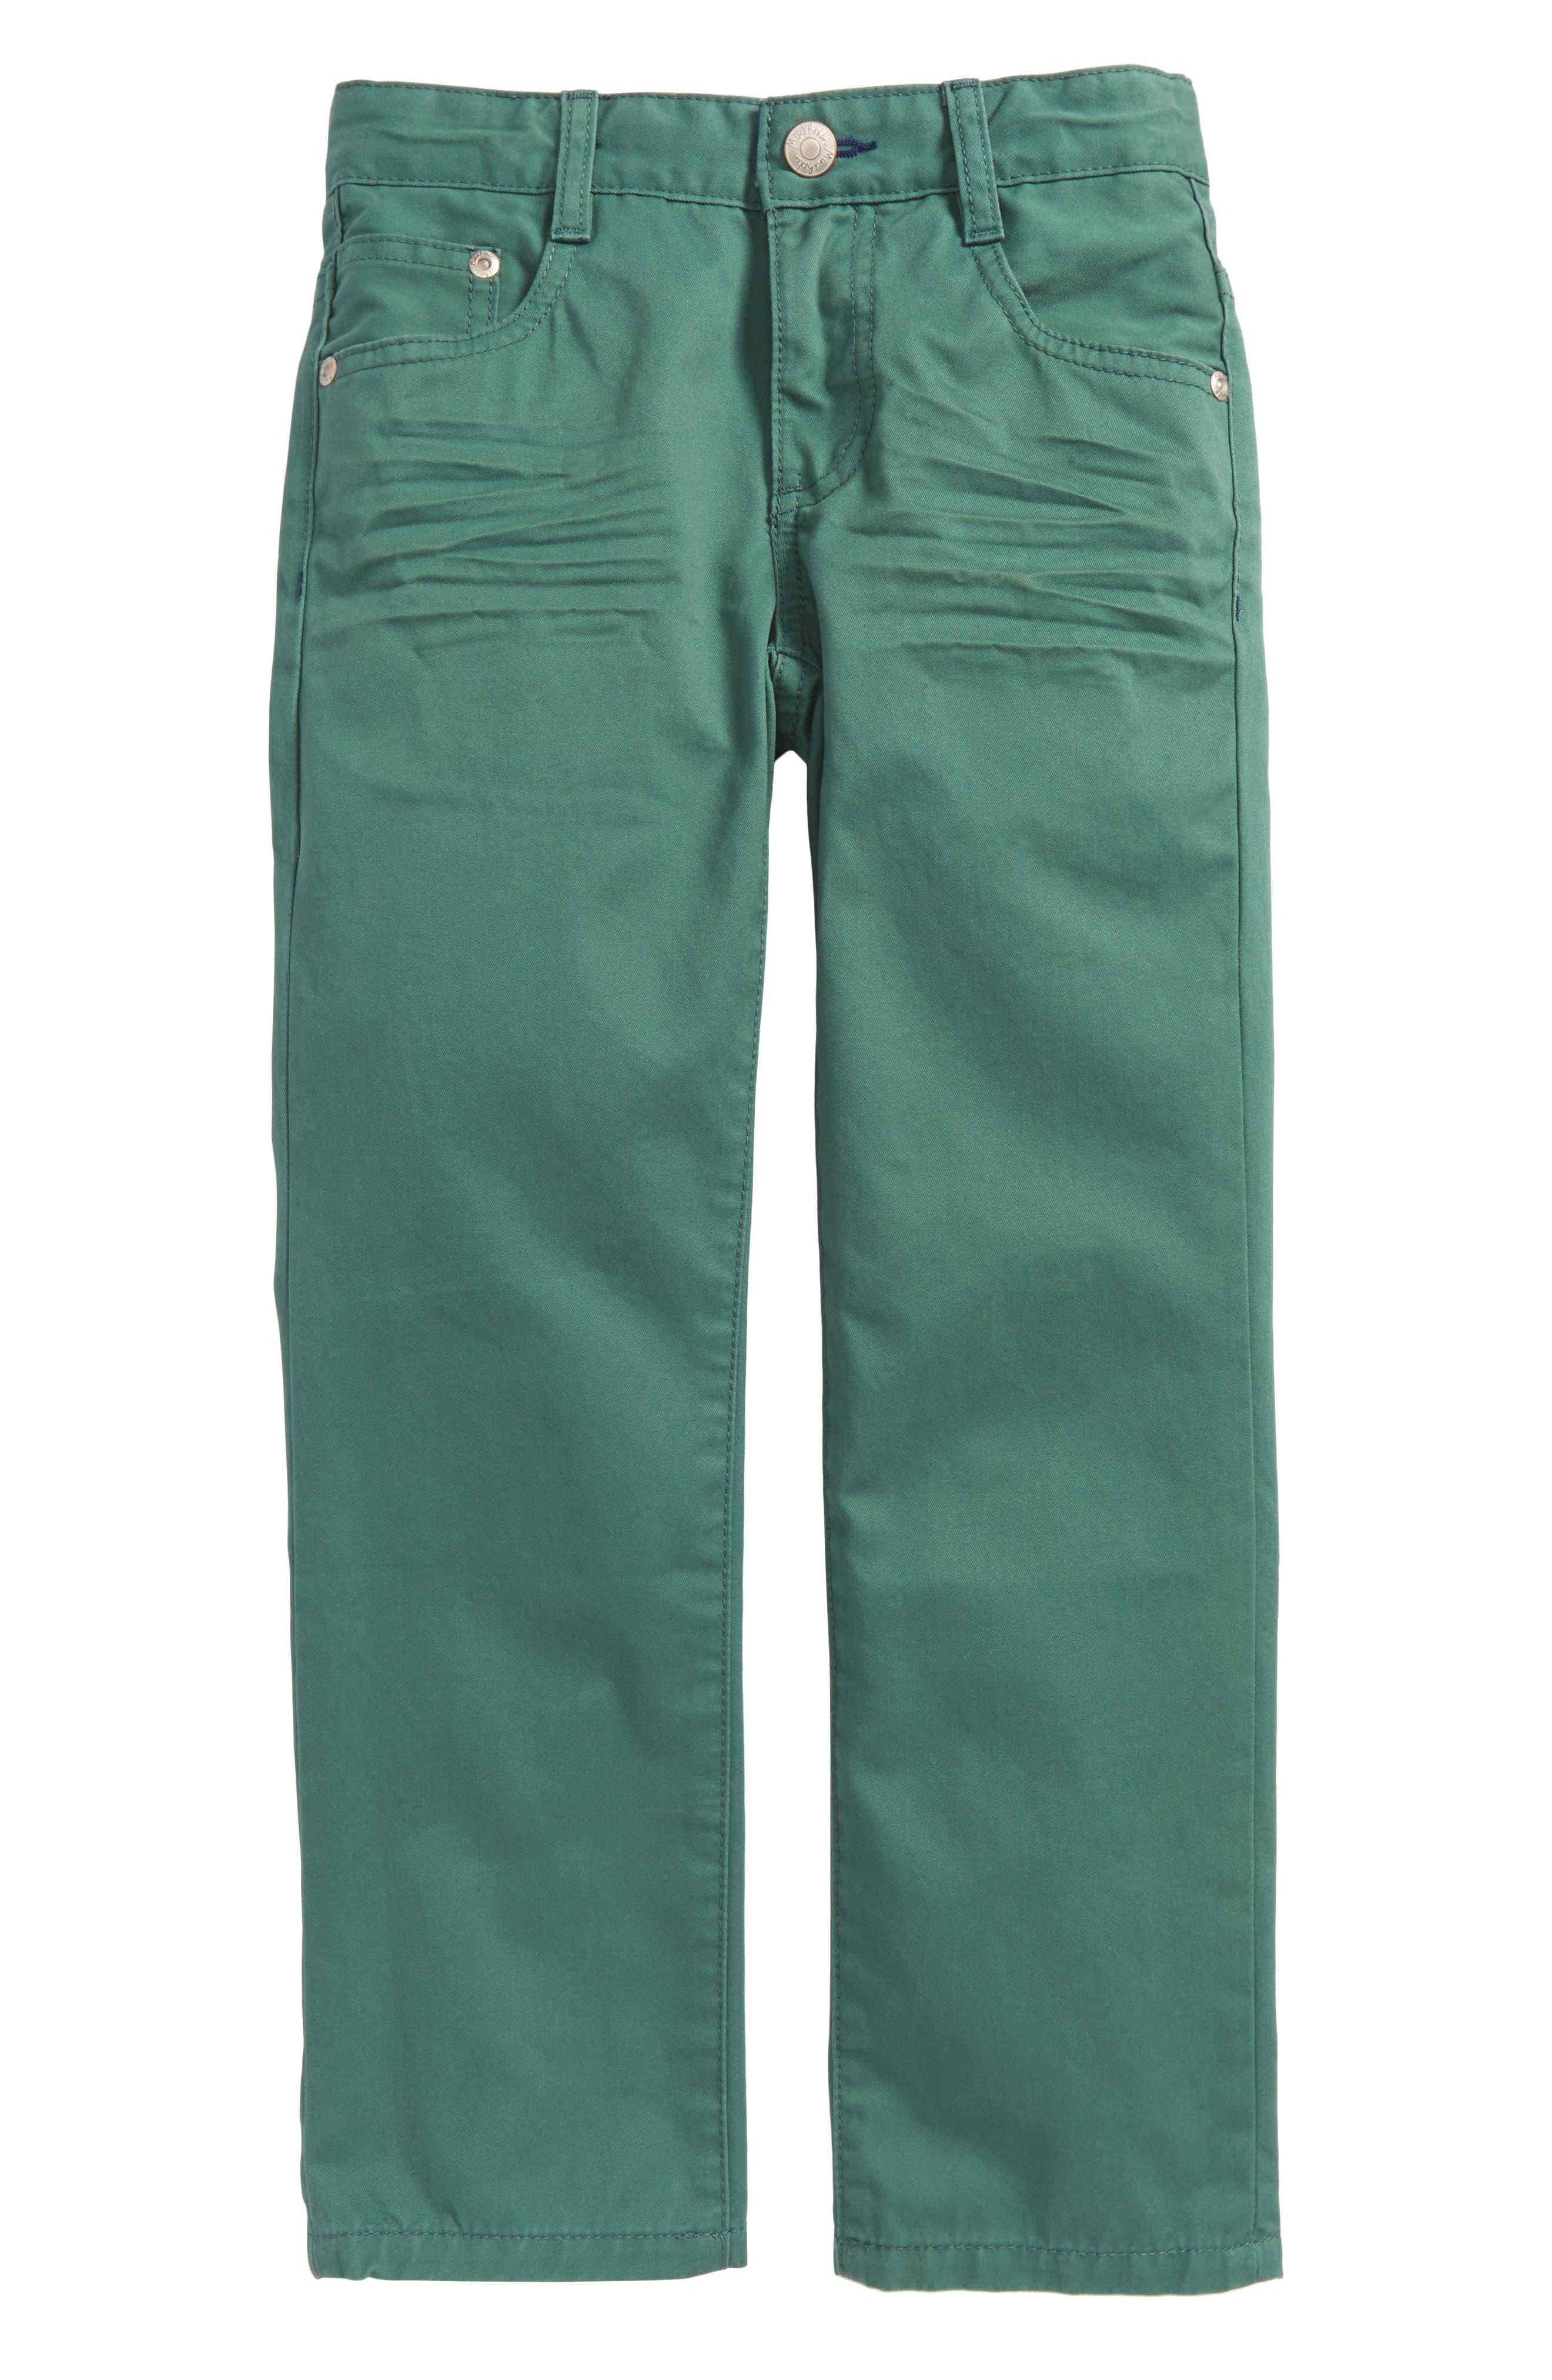 Slim Jeans,                             Main thumbnail 1, color,                             Rosemary Green